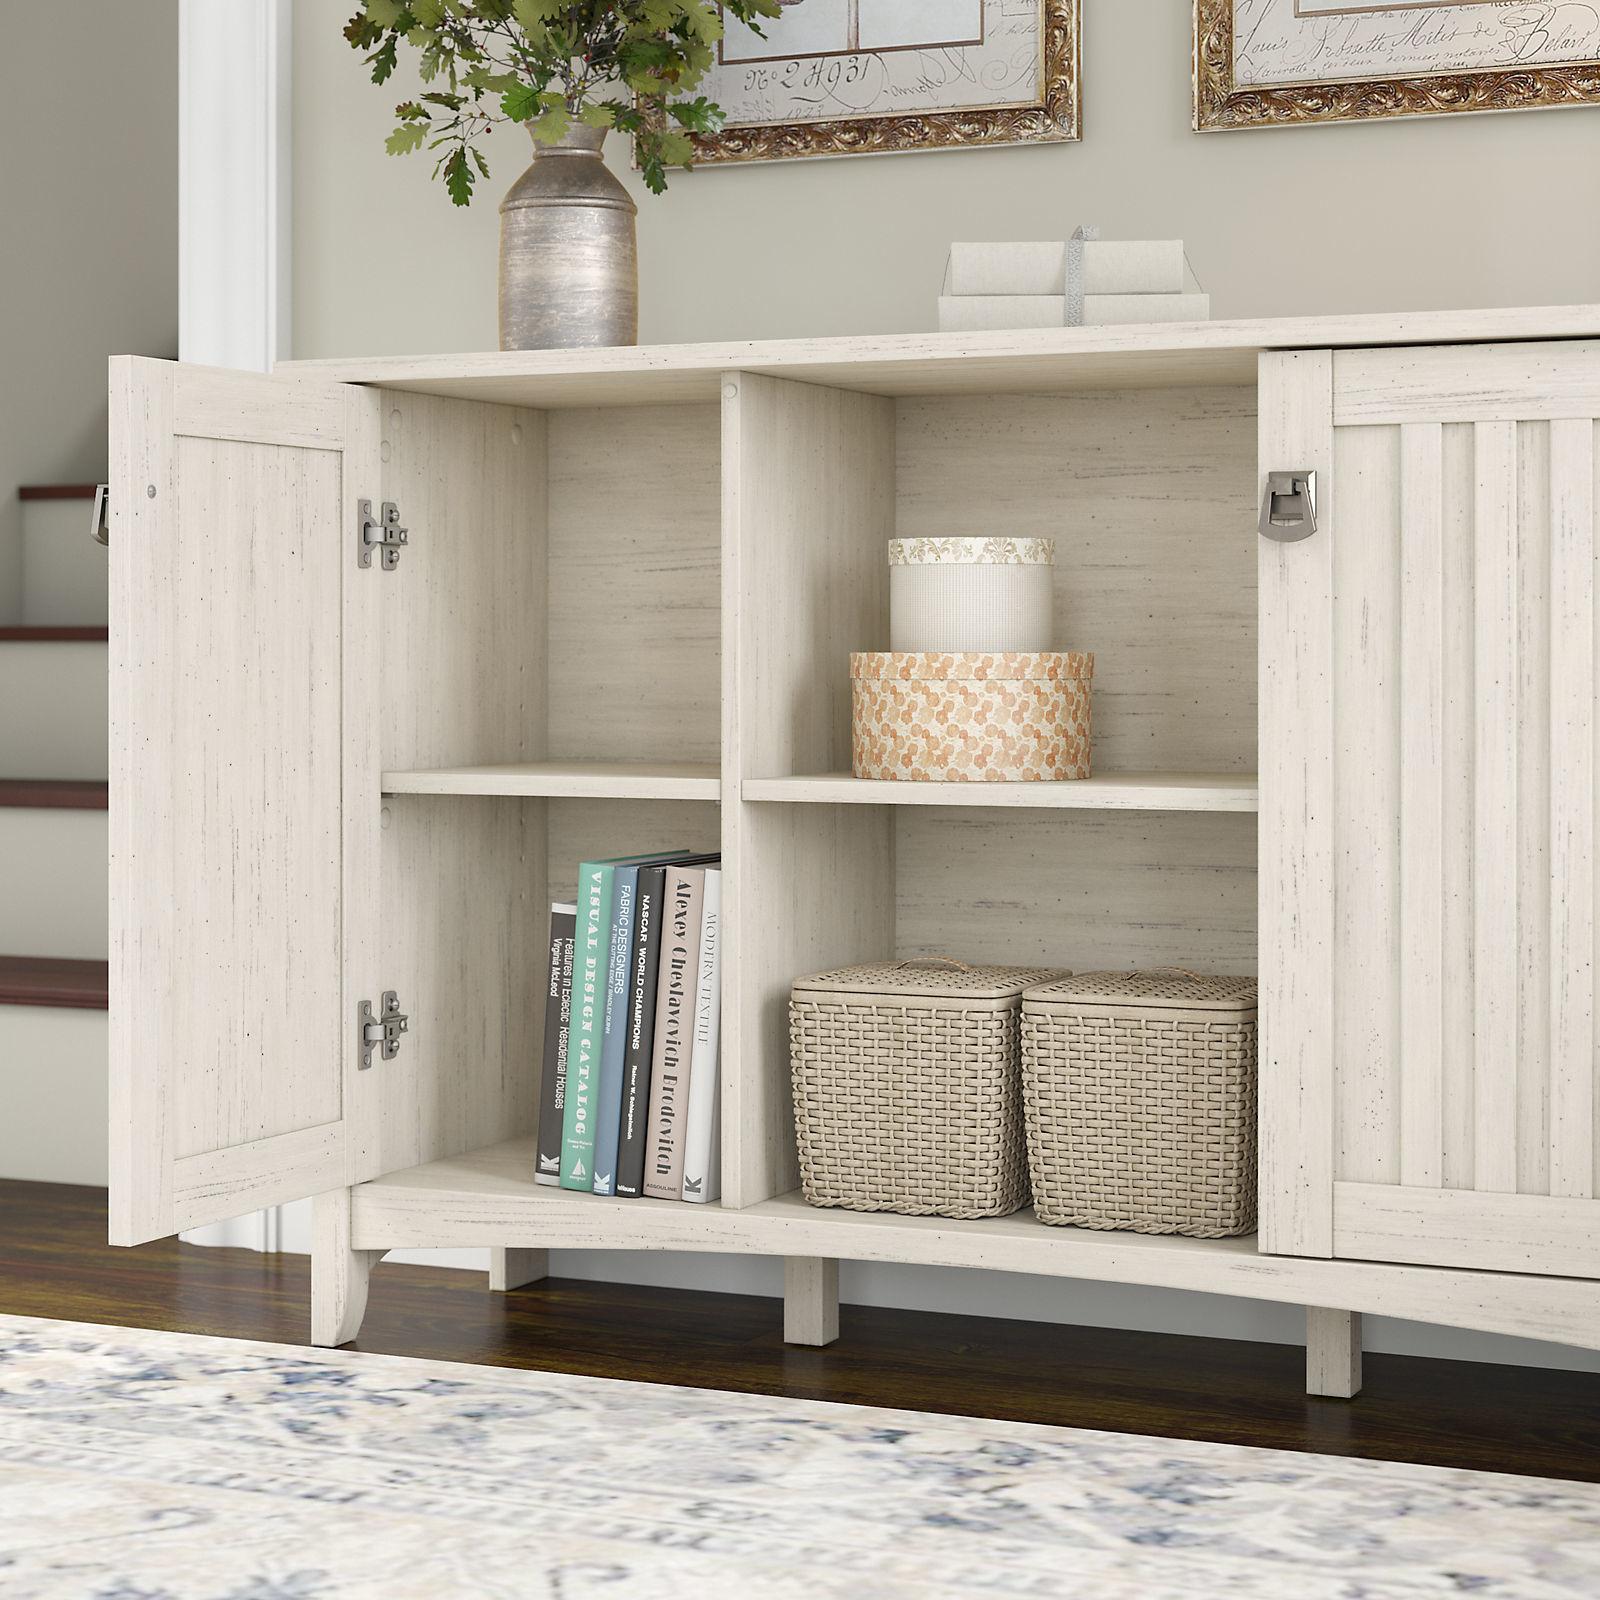 Shop Maison Rouge Lucius Antique White Storage Cabinet With Doors